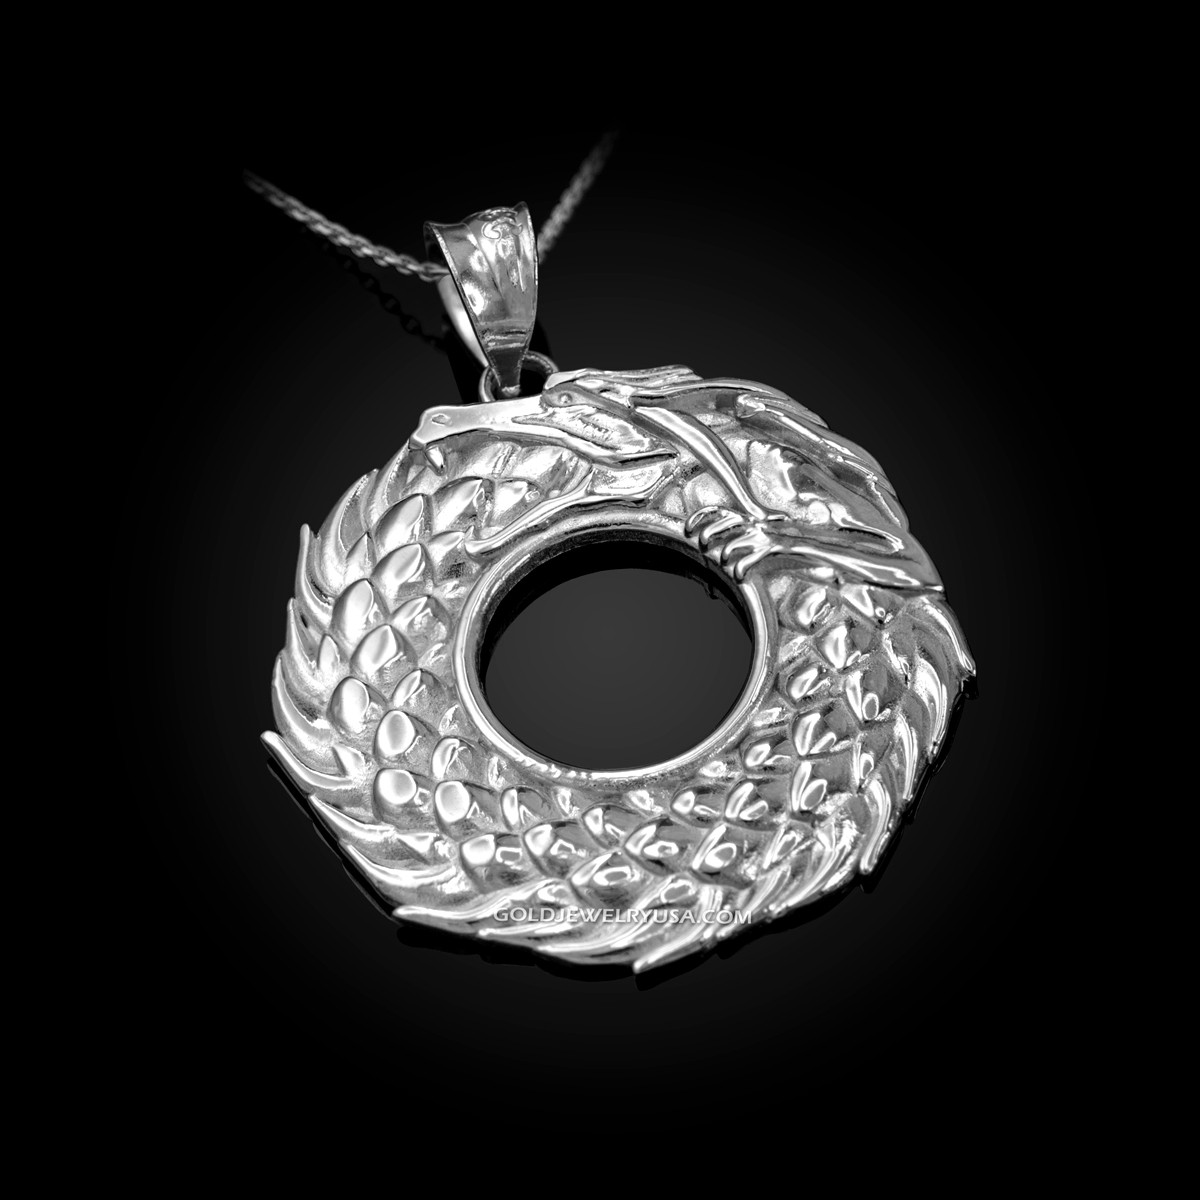 10K Yellow Gold Ouroboros Tail Biting Snake Pendant Necklace